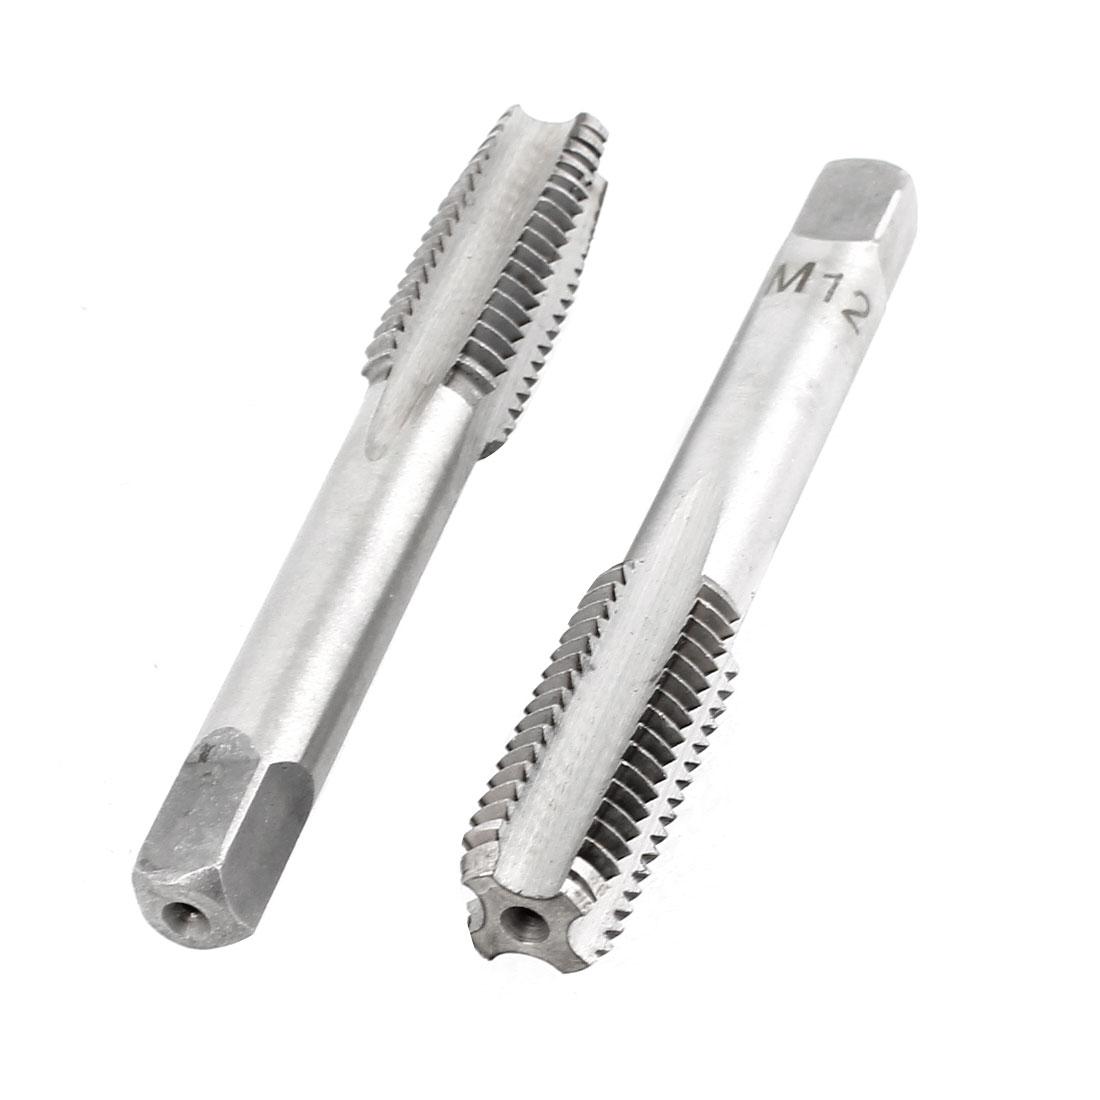 2 Pcs M12x30mm HSS 4 Flutes Hand Screw Thread Straight Metric Taps